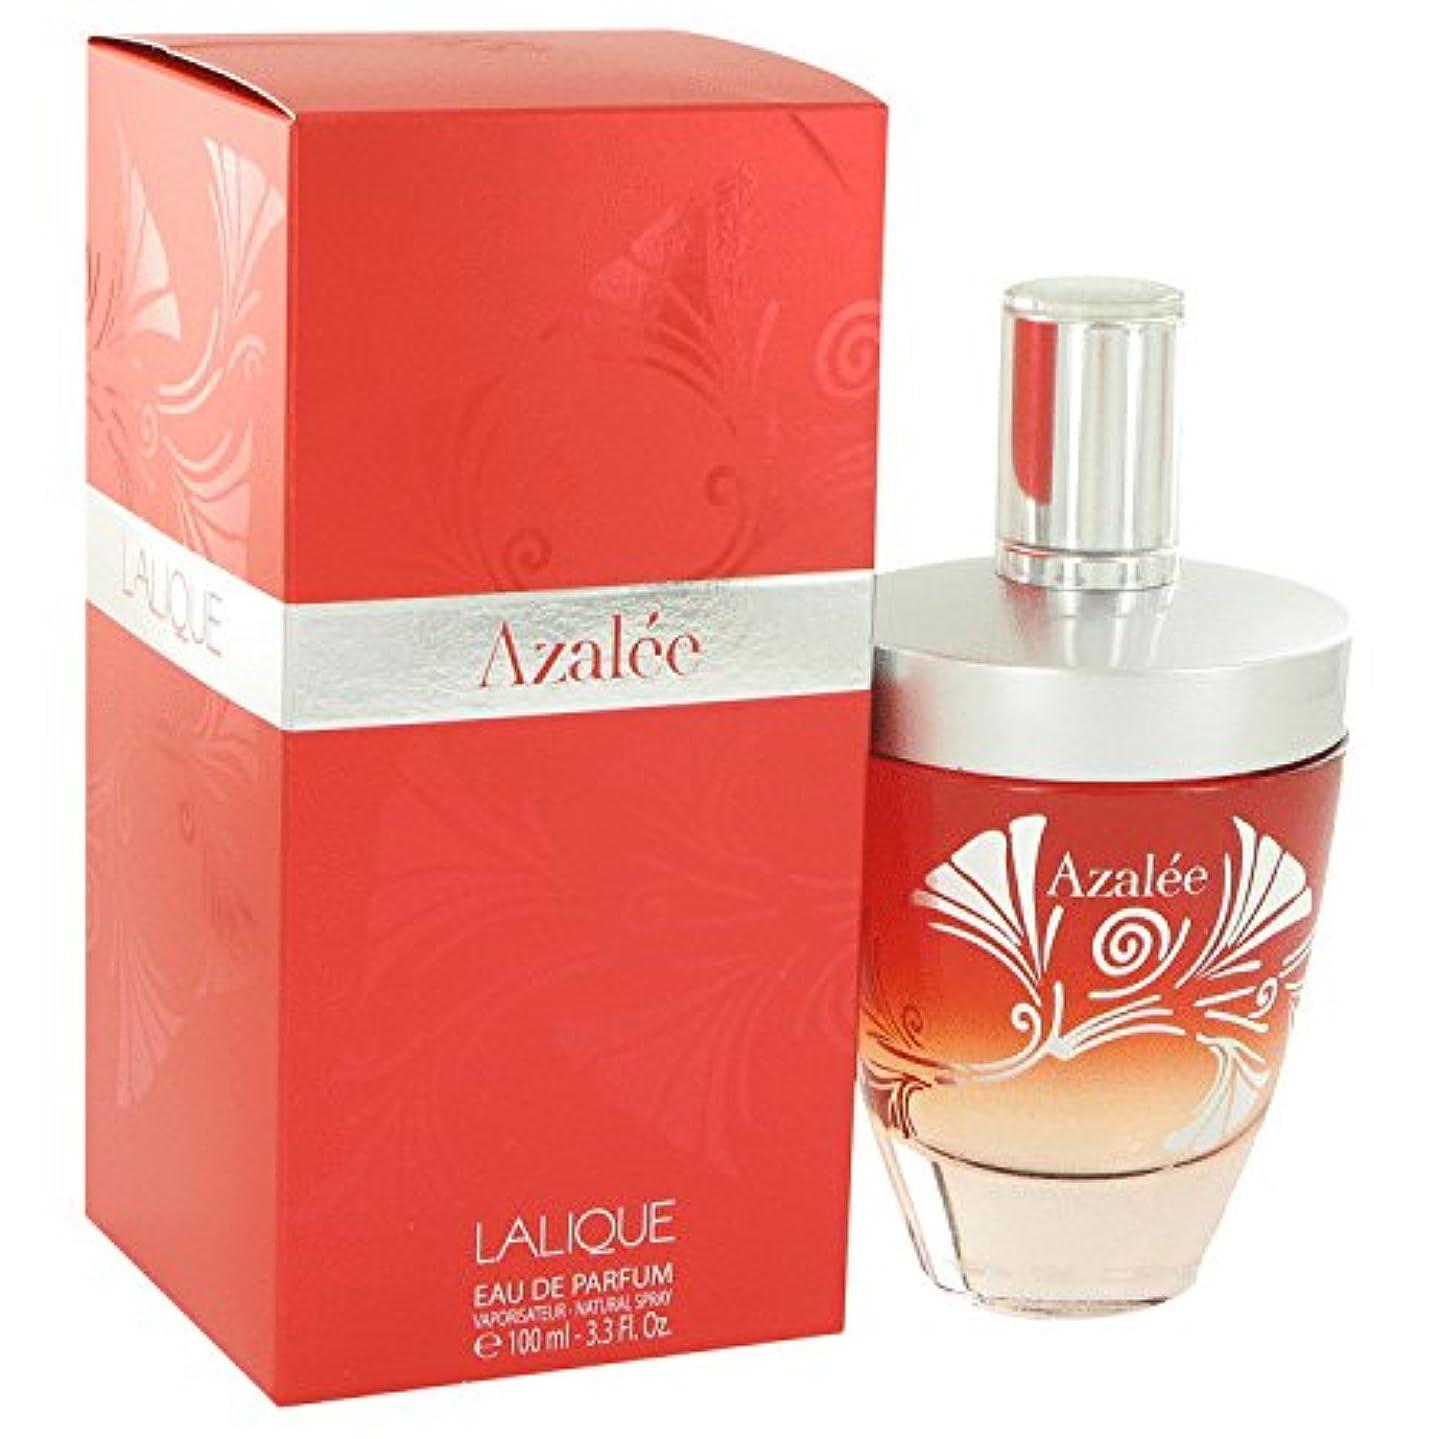 L?lique Az?lee P?rfume For Women 3.3 oz Eau De Parfum Spray + Free Shower Gel